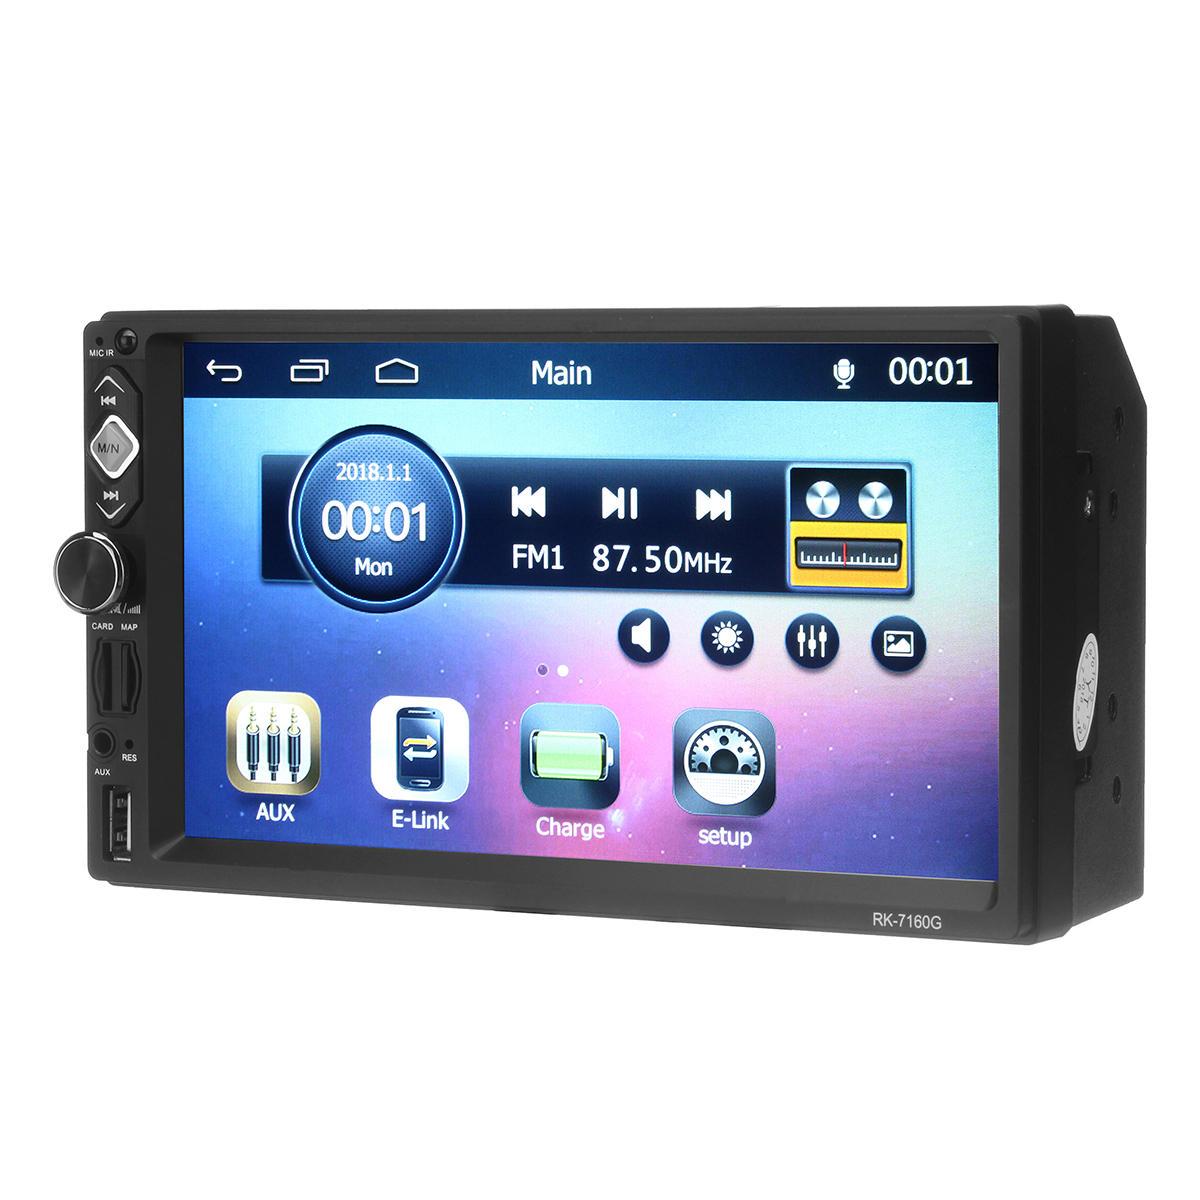 RK-7160G 7 дюймов GPS HD MP5 Плеер Стерео Радио Bluetooth FM RDS Быстрое зарядное зеркало Link Cam